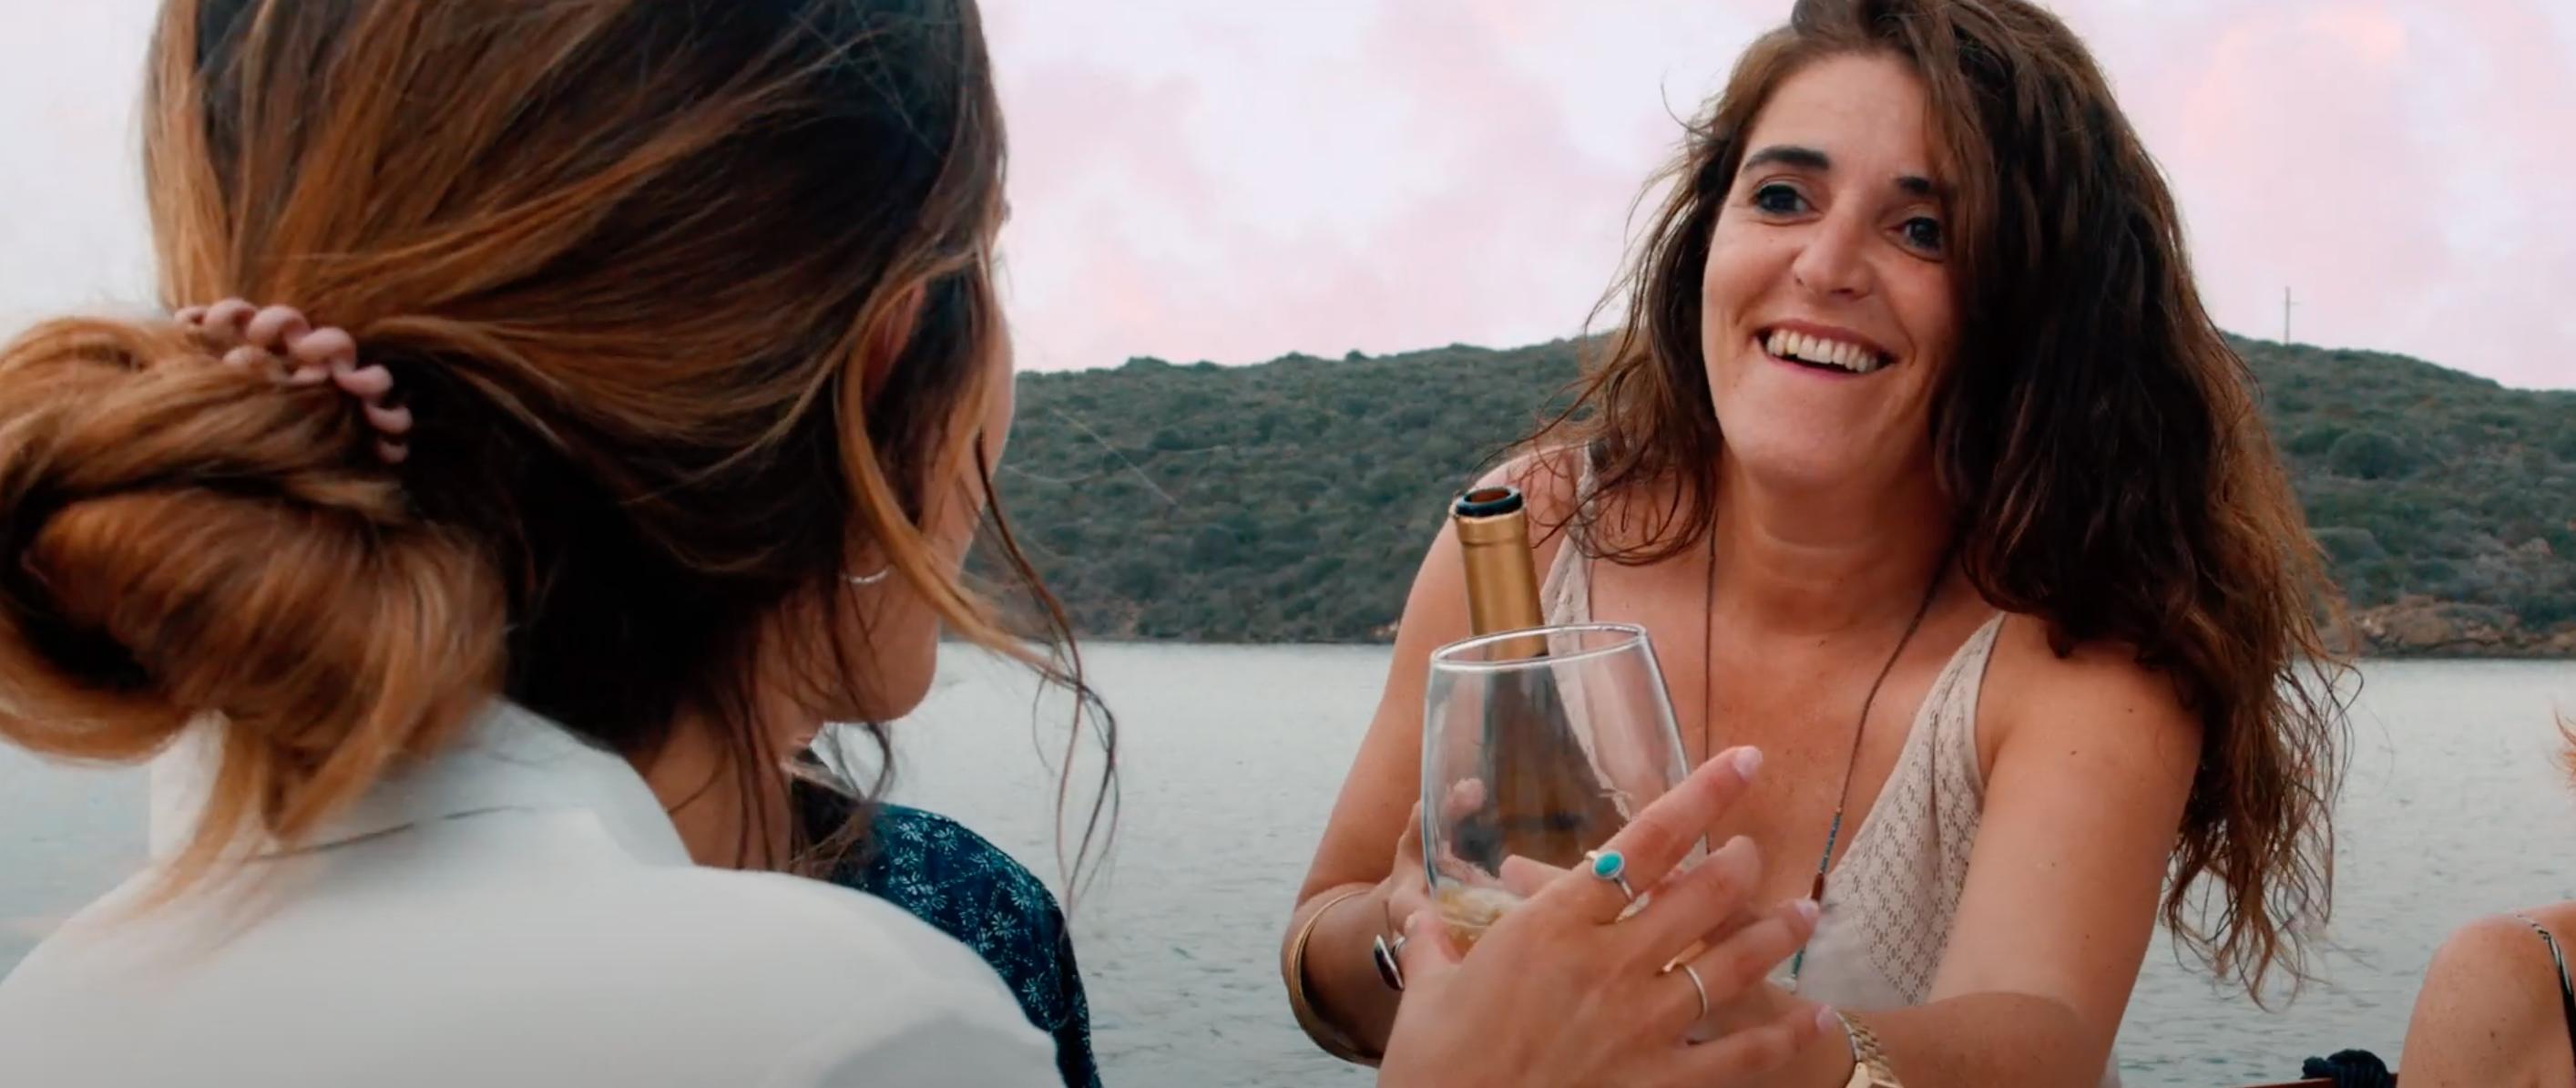 Frame del curt premiat 'A Food and Love Story'   captura